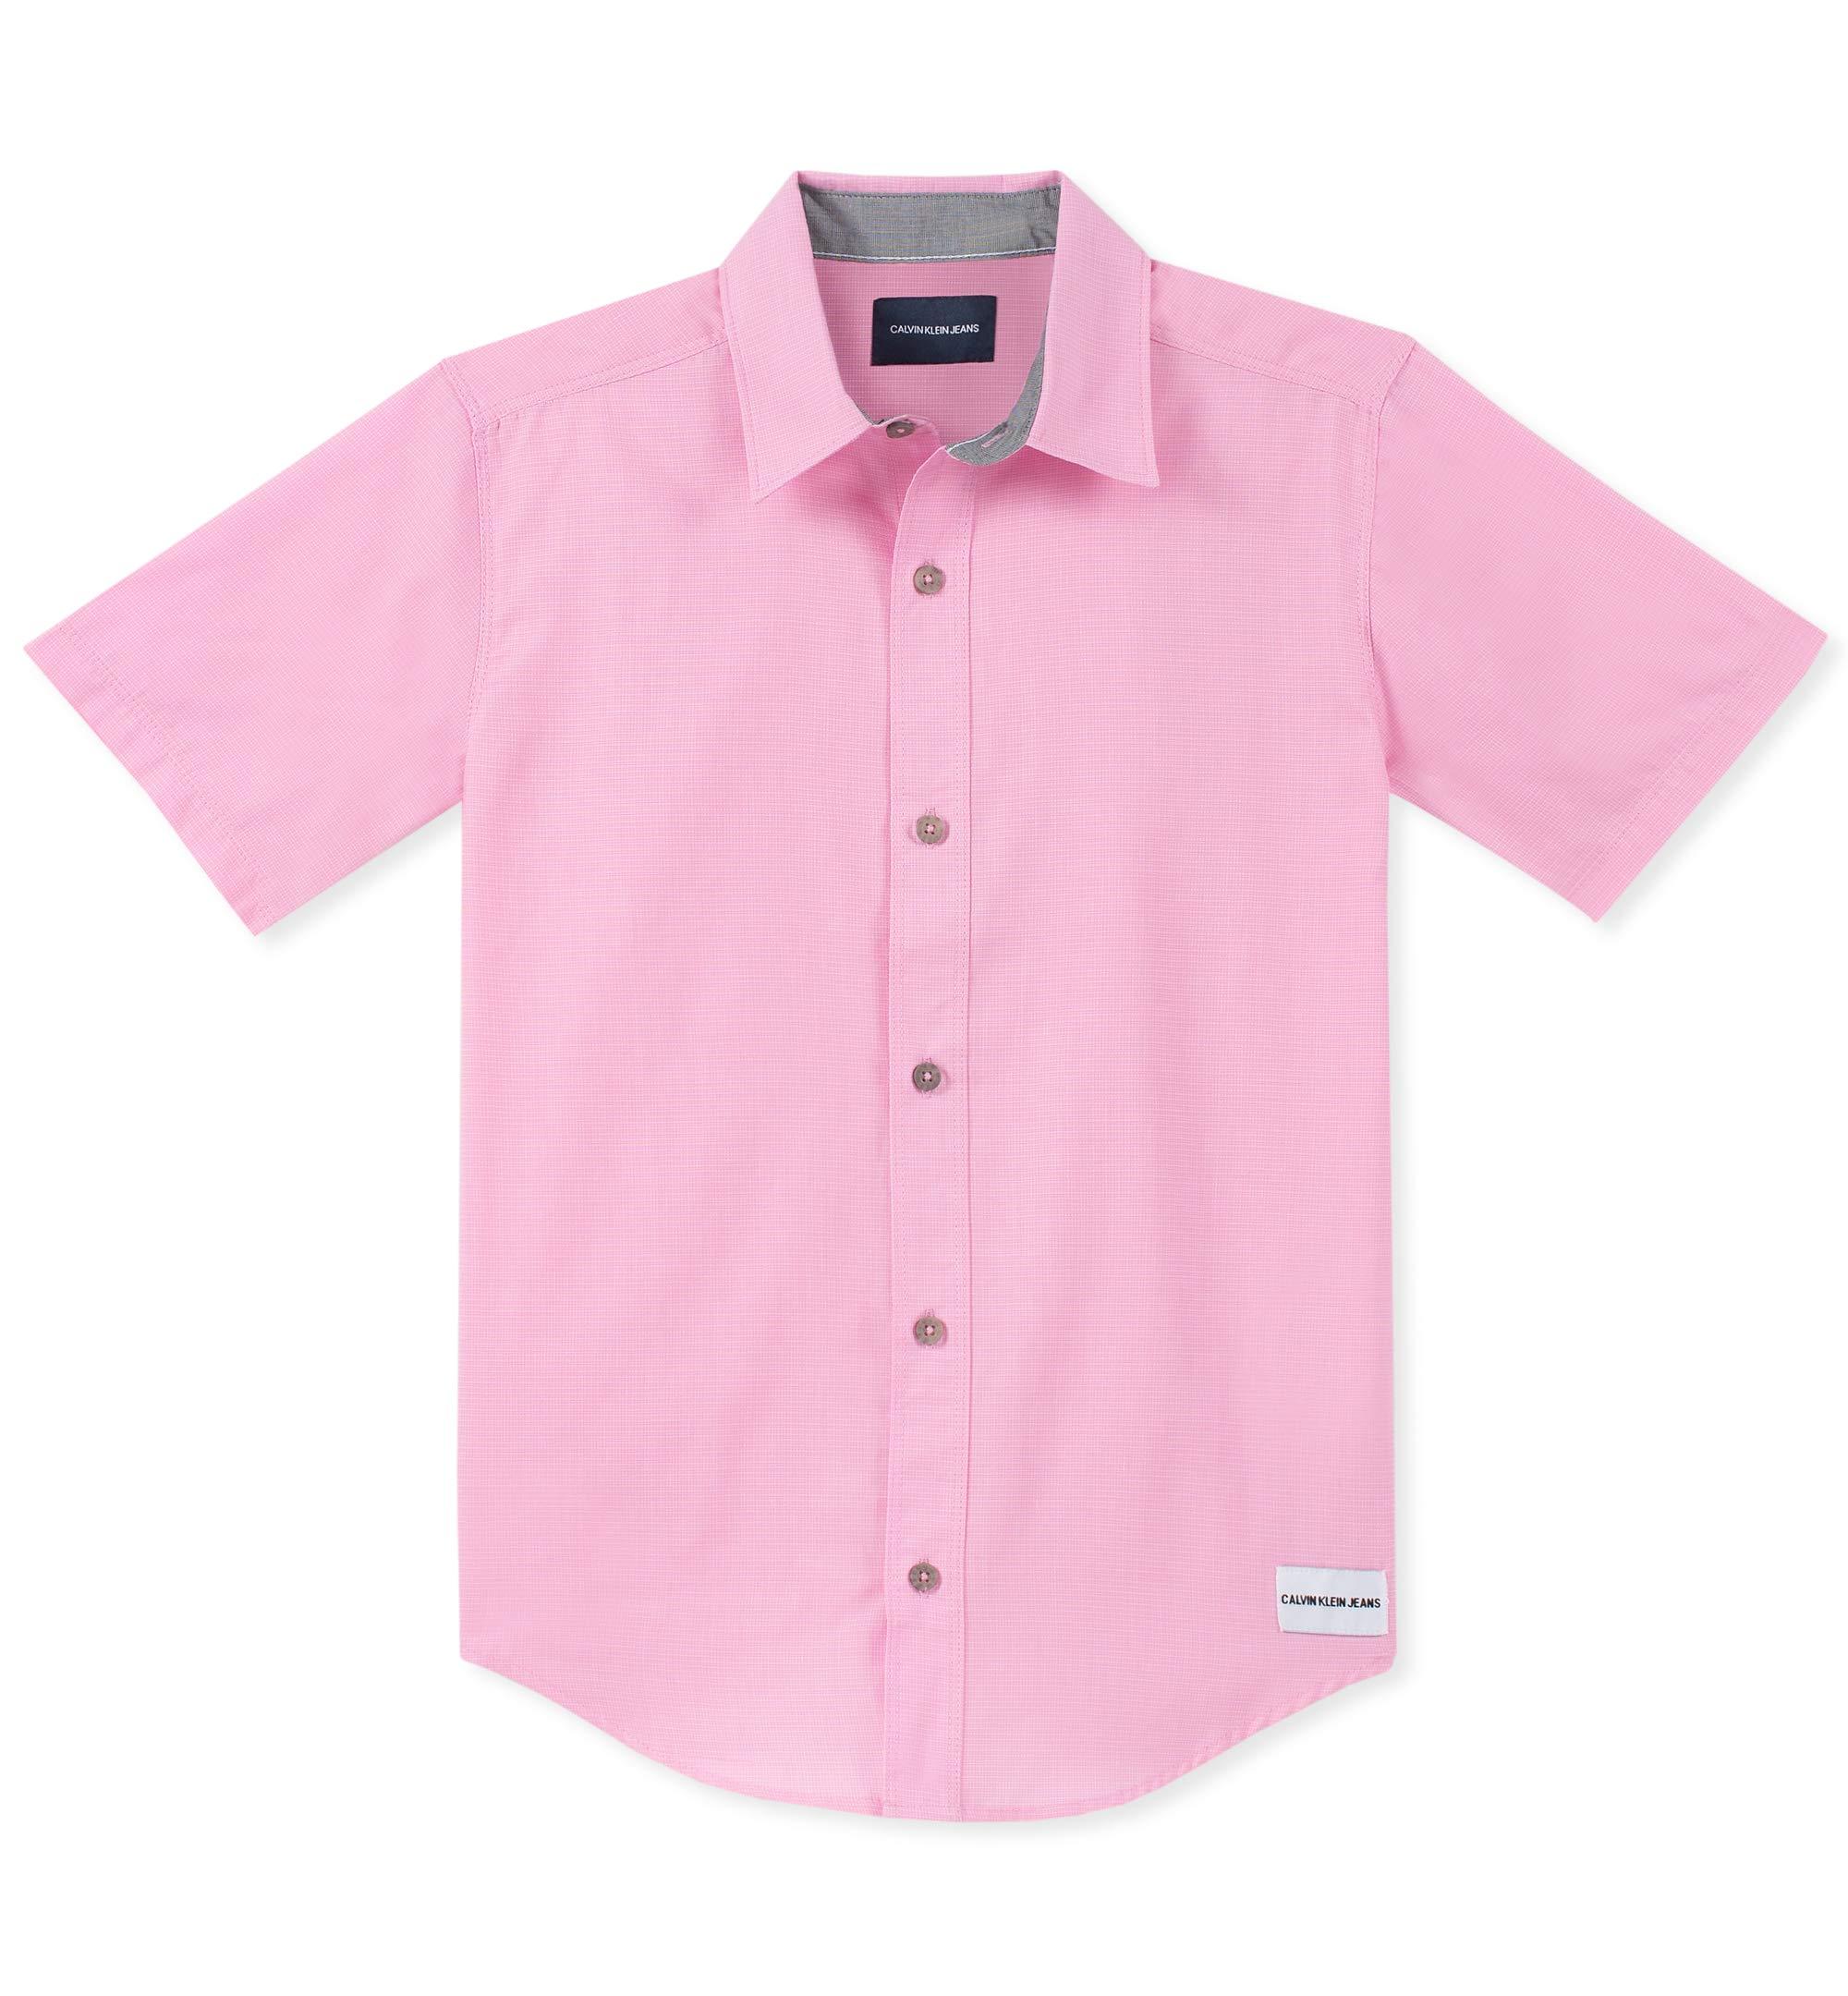 Calvin Klein Boys' Big Horizontal Chambray Short Sleeve Shirt, Begonia Pink, Large (14/16)